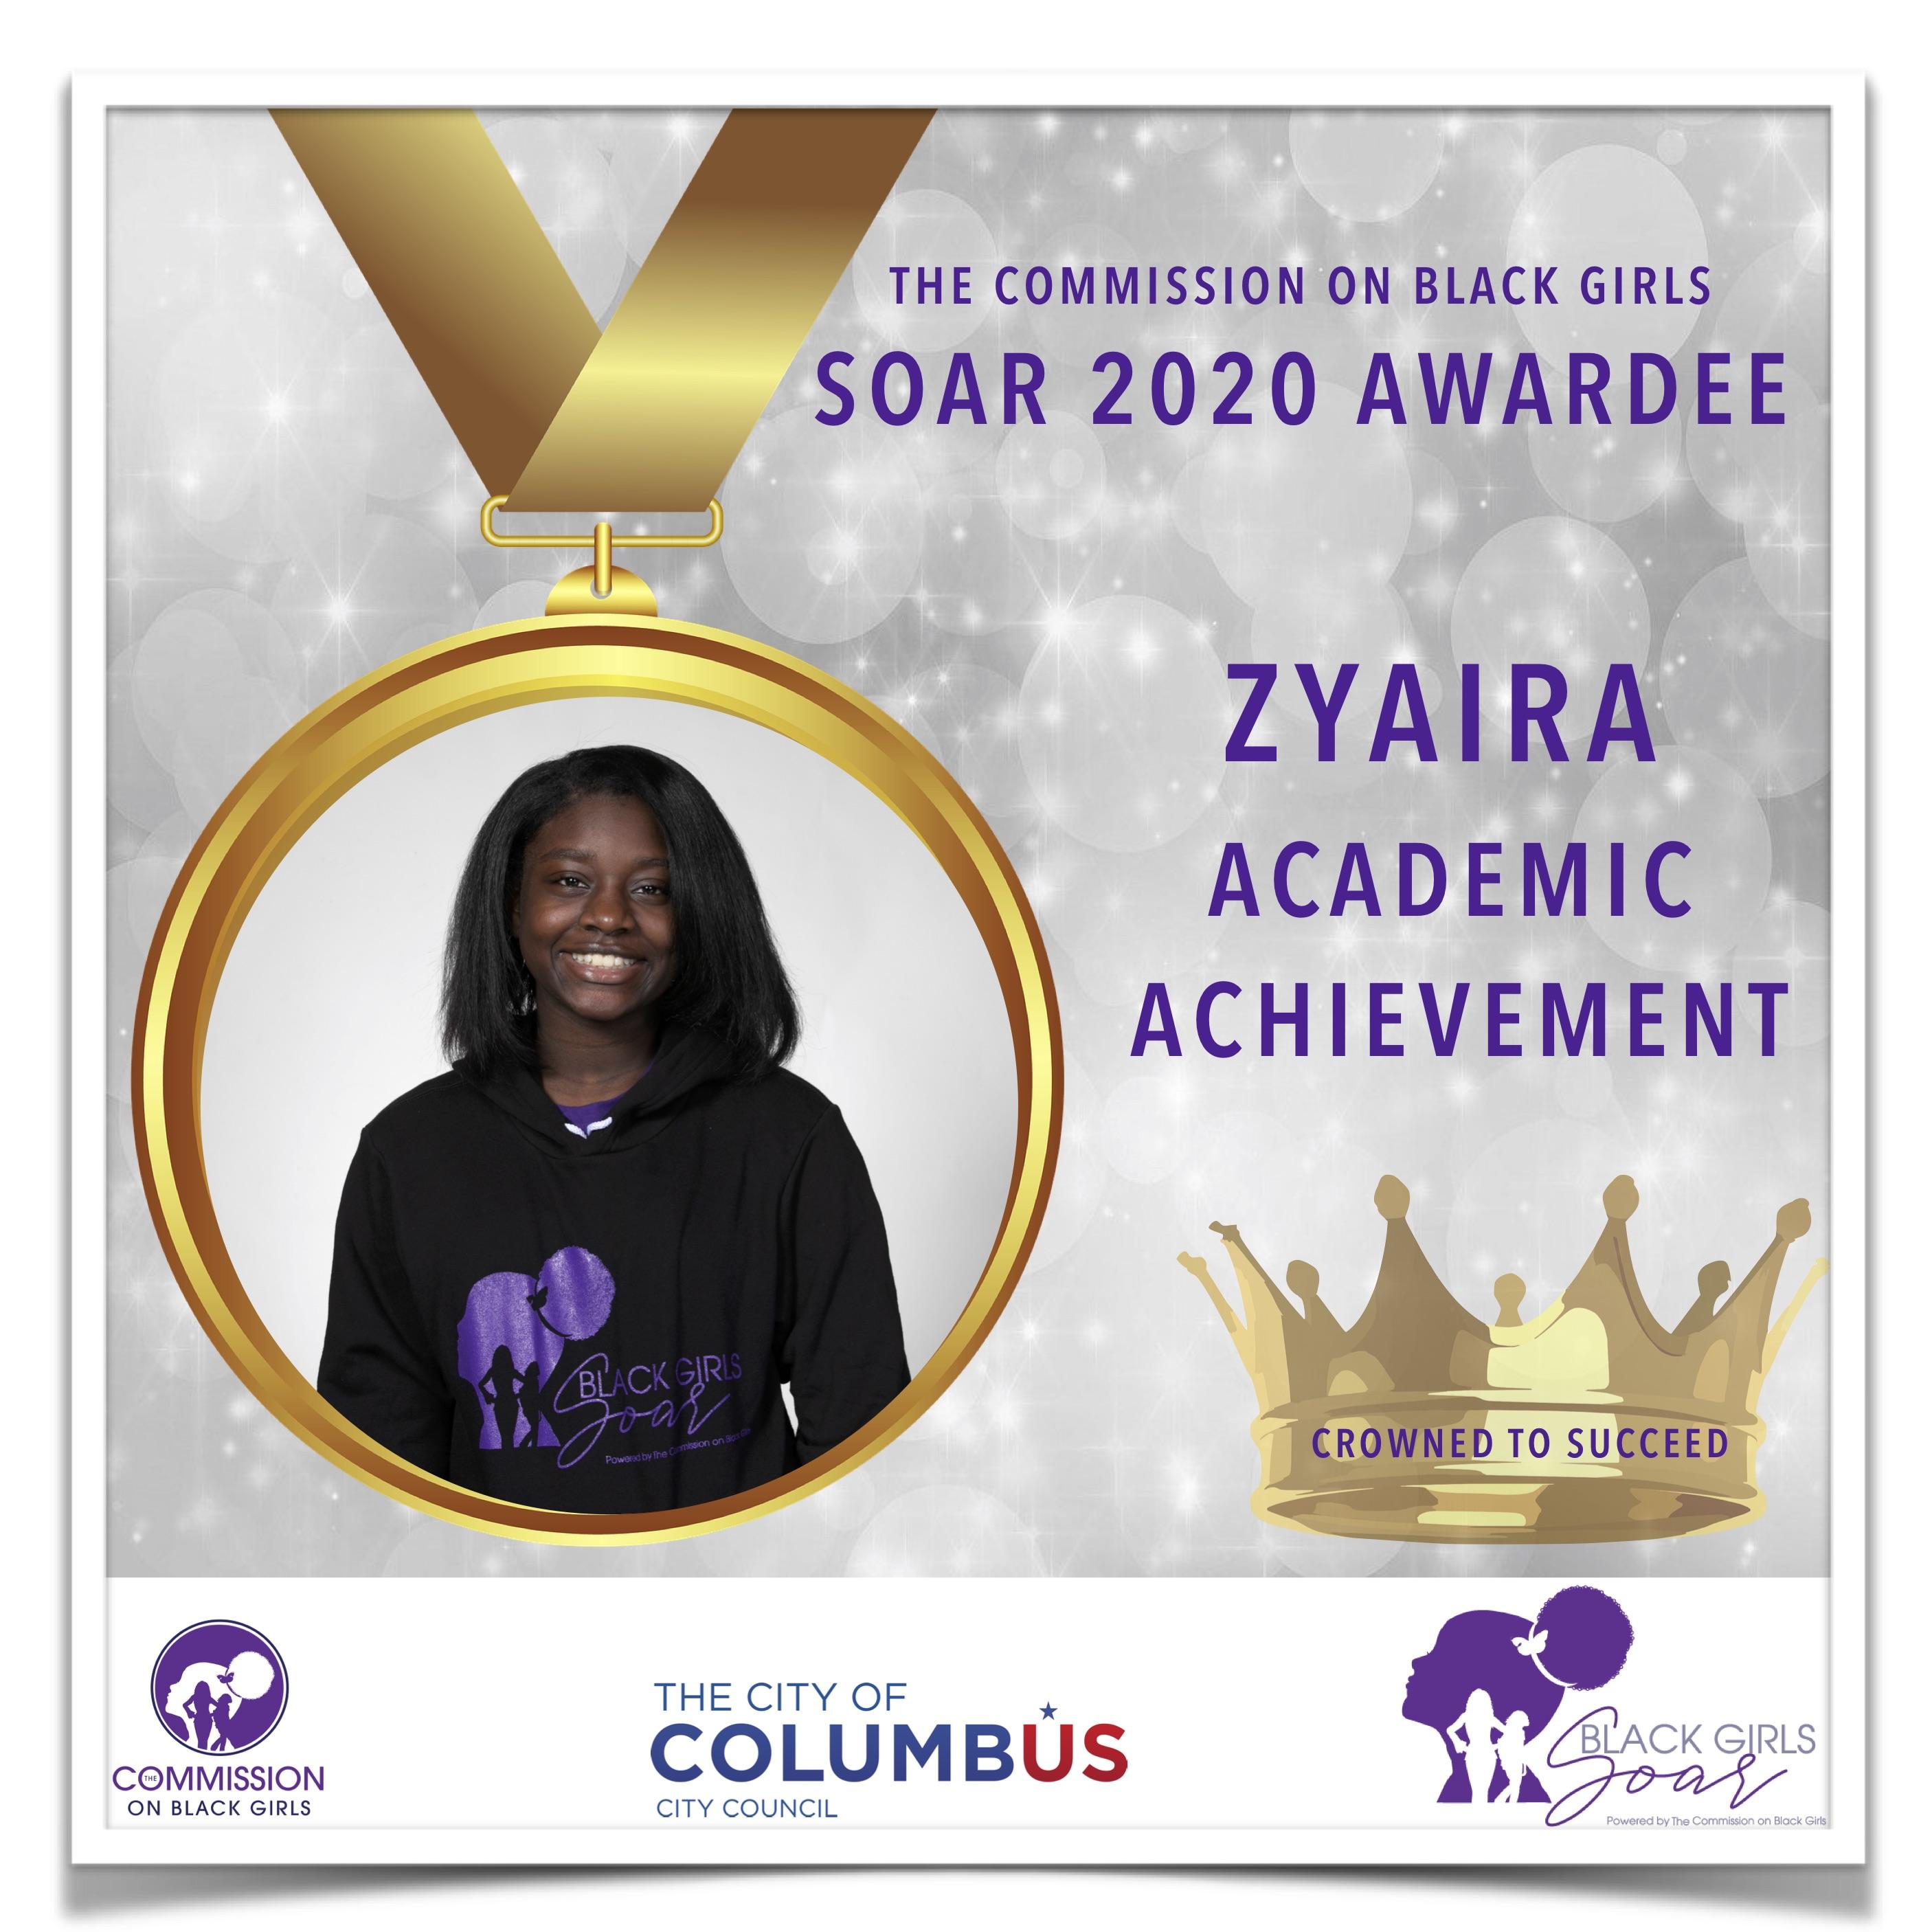 17 SOAR 2020 Zyaira Academic Achievement